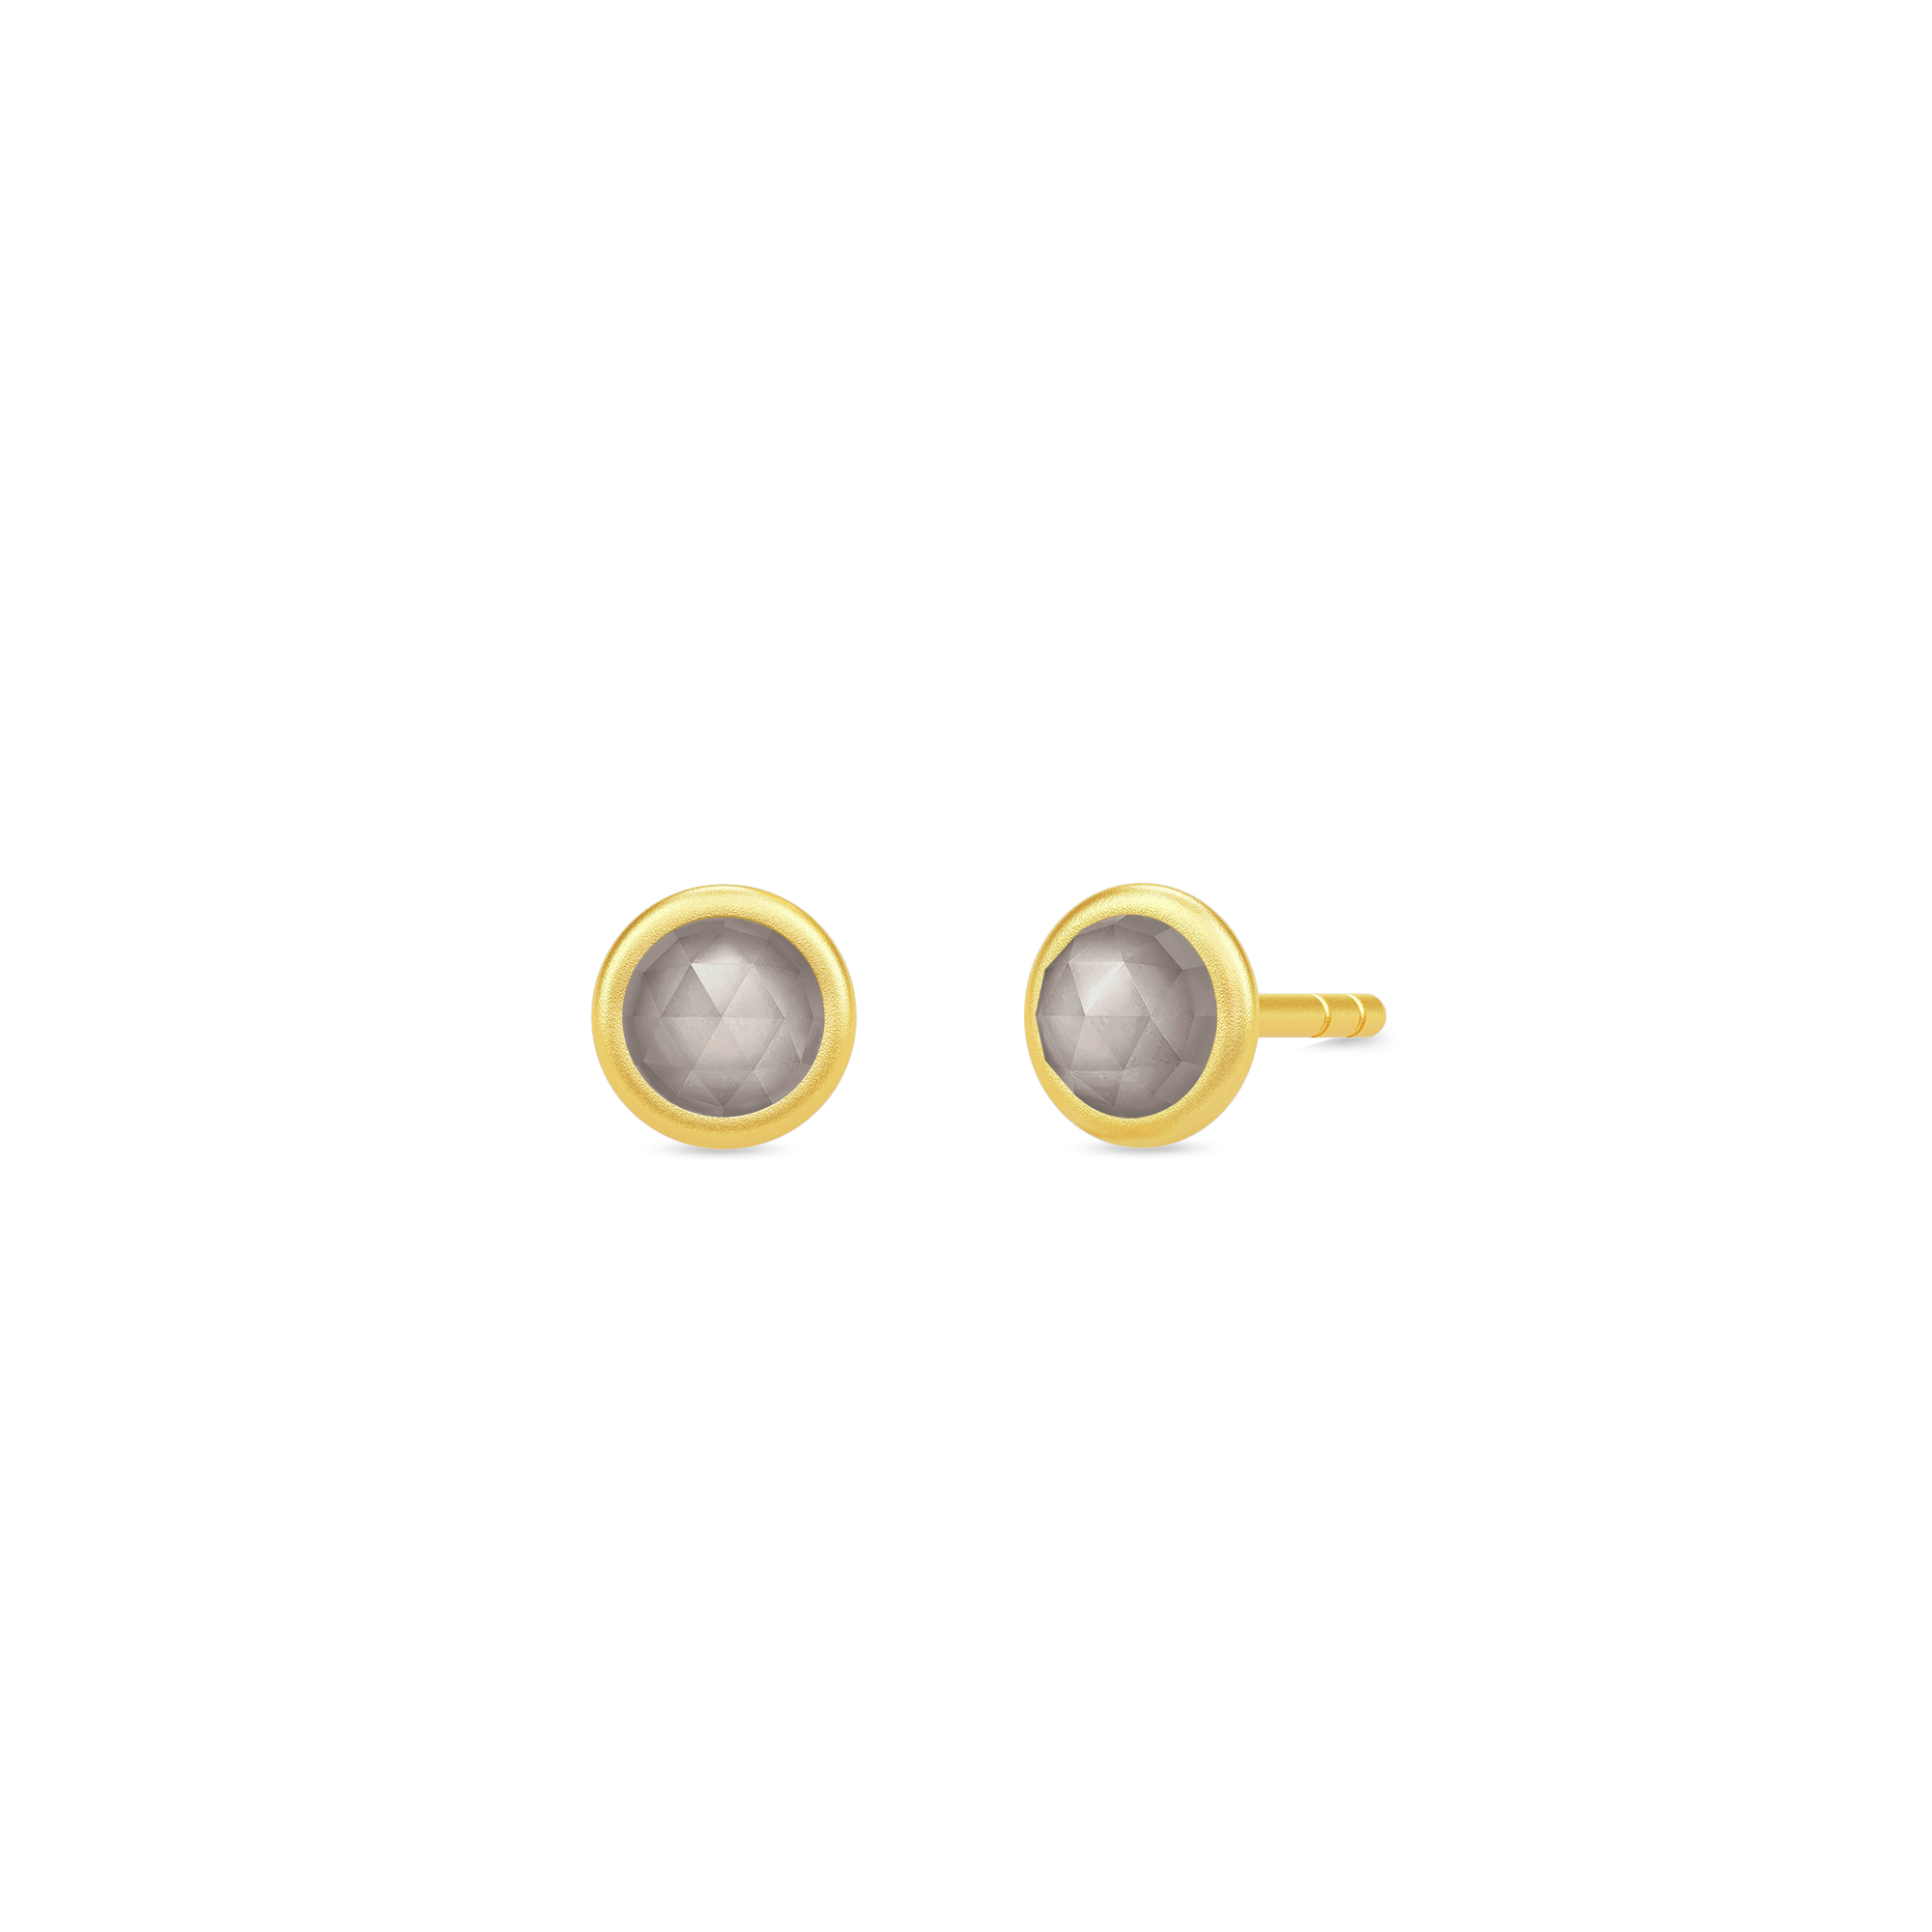 Julie Sandlau Moon ørestikker i forgyldt med grå månesten